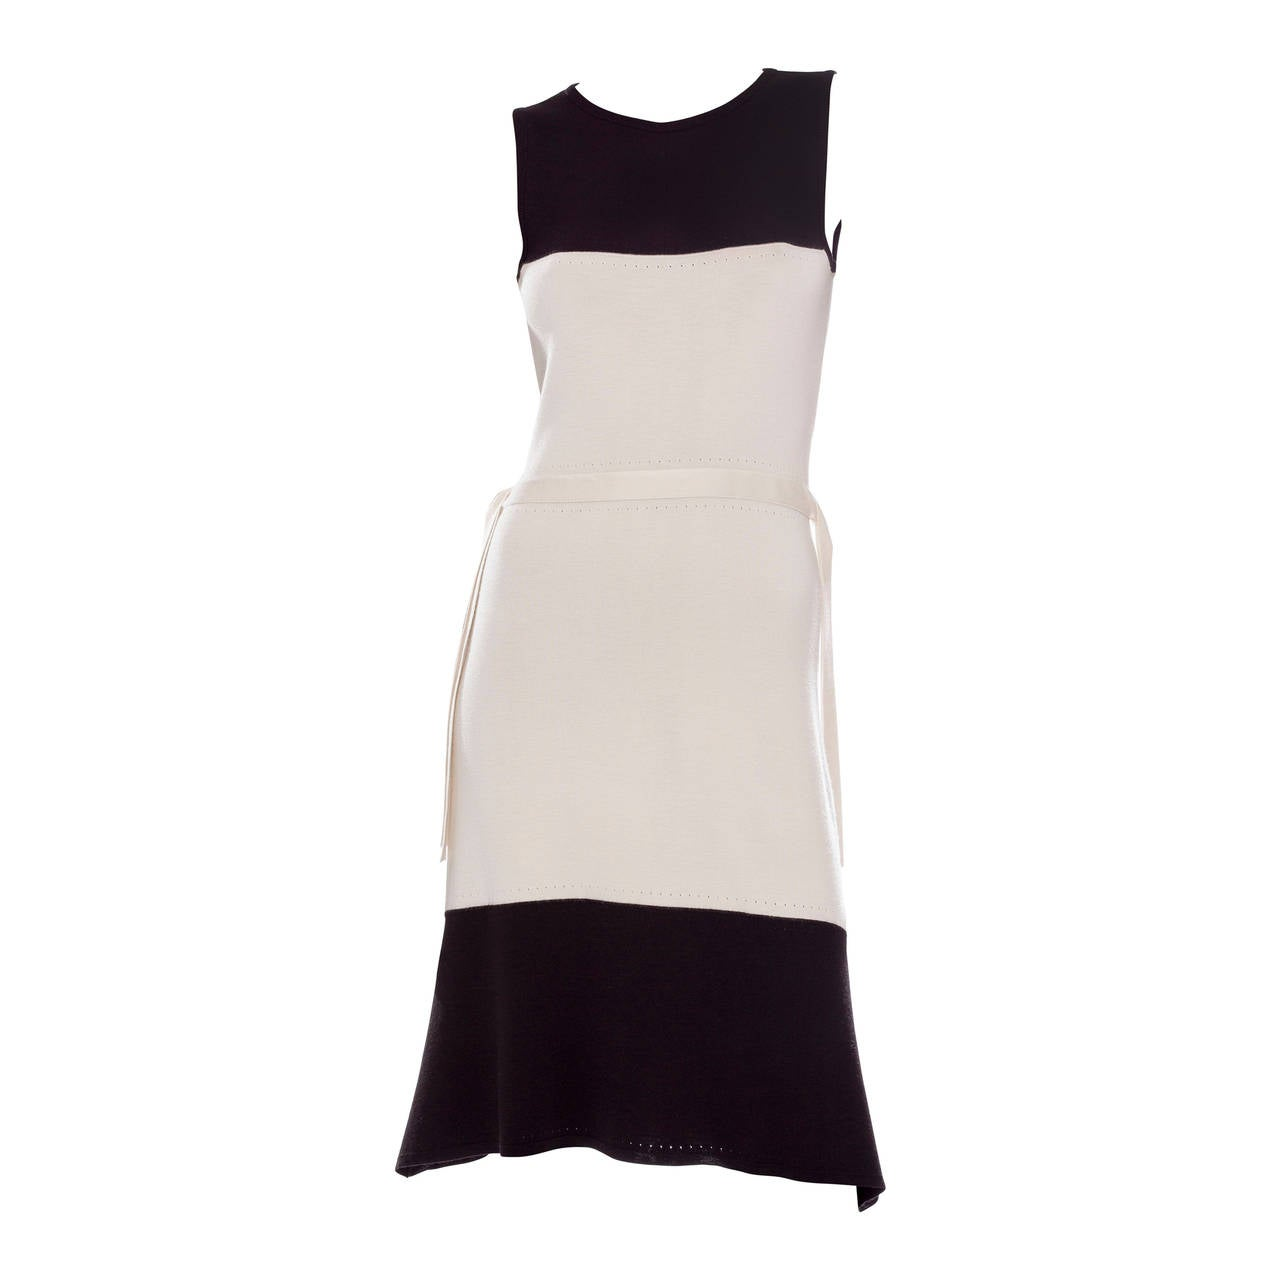 Chado Ralph Rucci Sleeveless Cashmere Dress